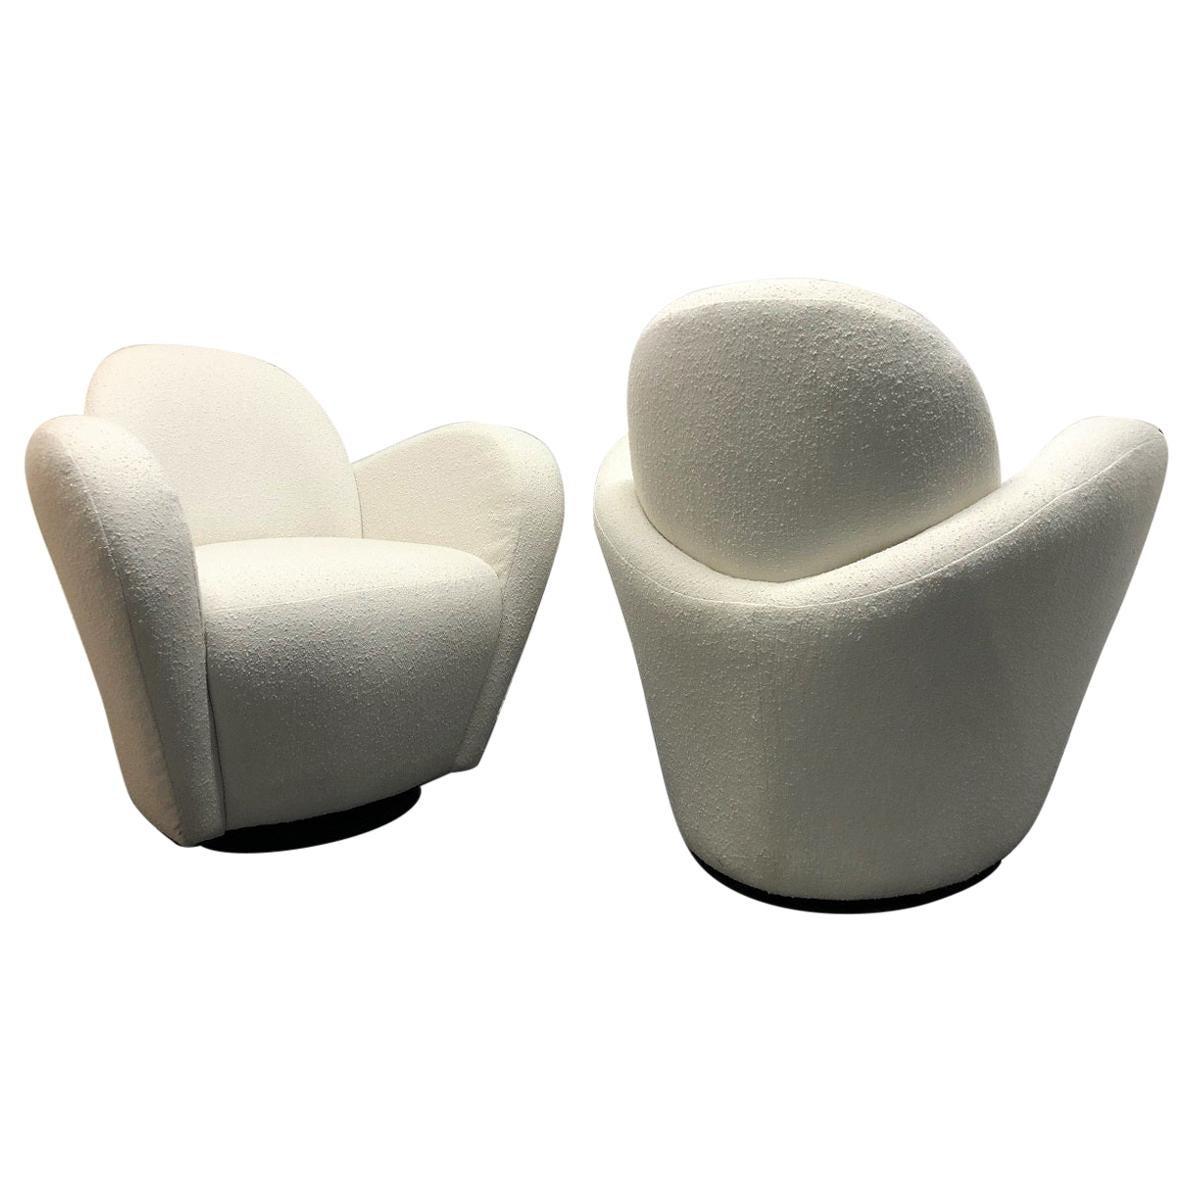 Pair of Vladimir Kagan for Directional Swivel Lounge Chairs